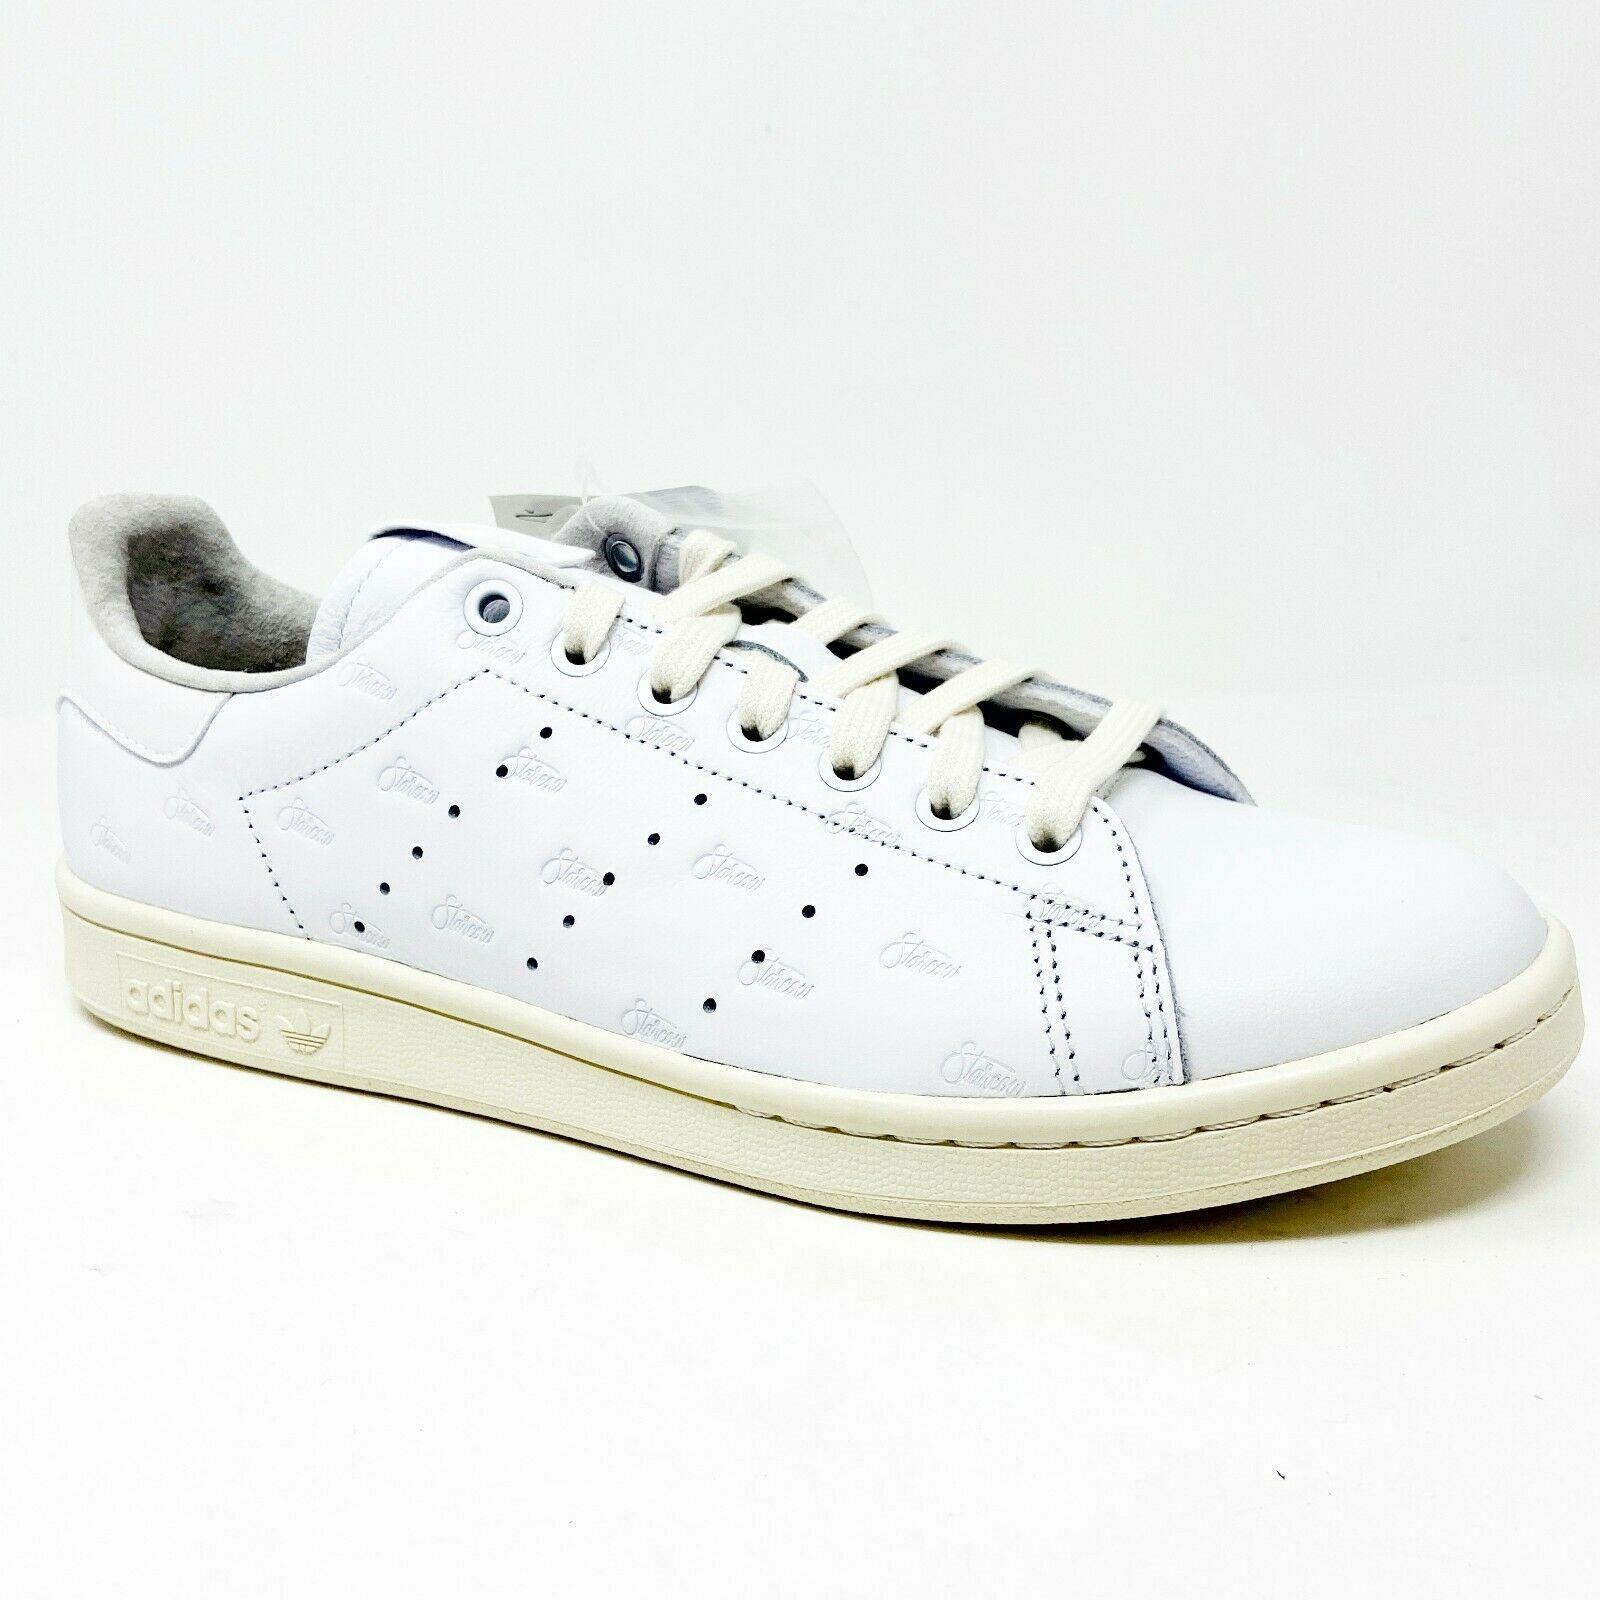 Adidas Stan Smith Alife X Starcow